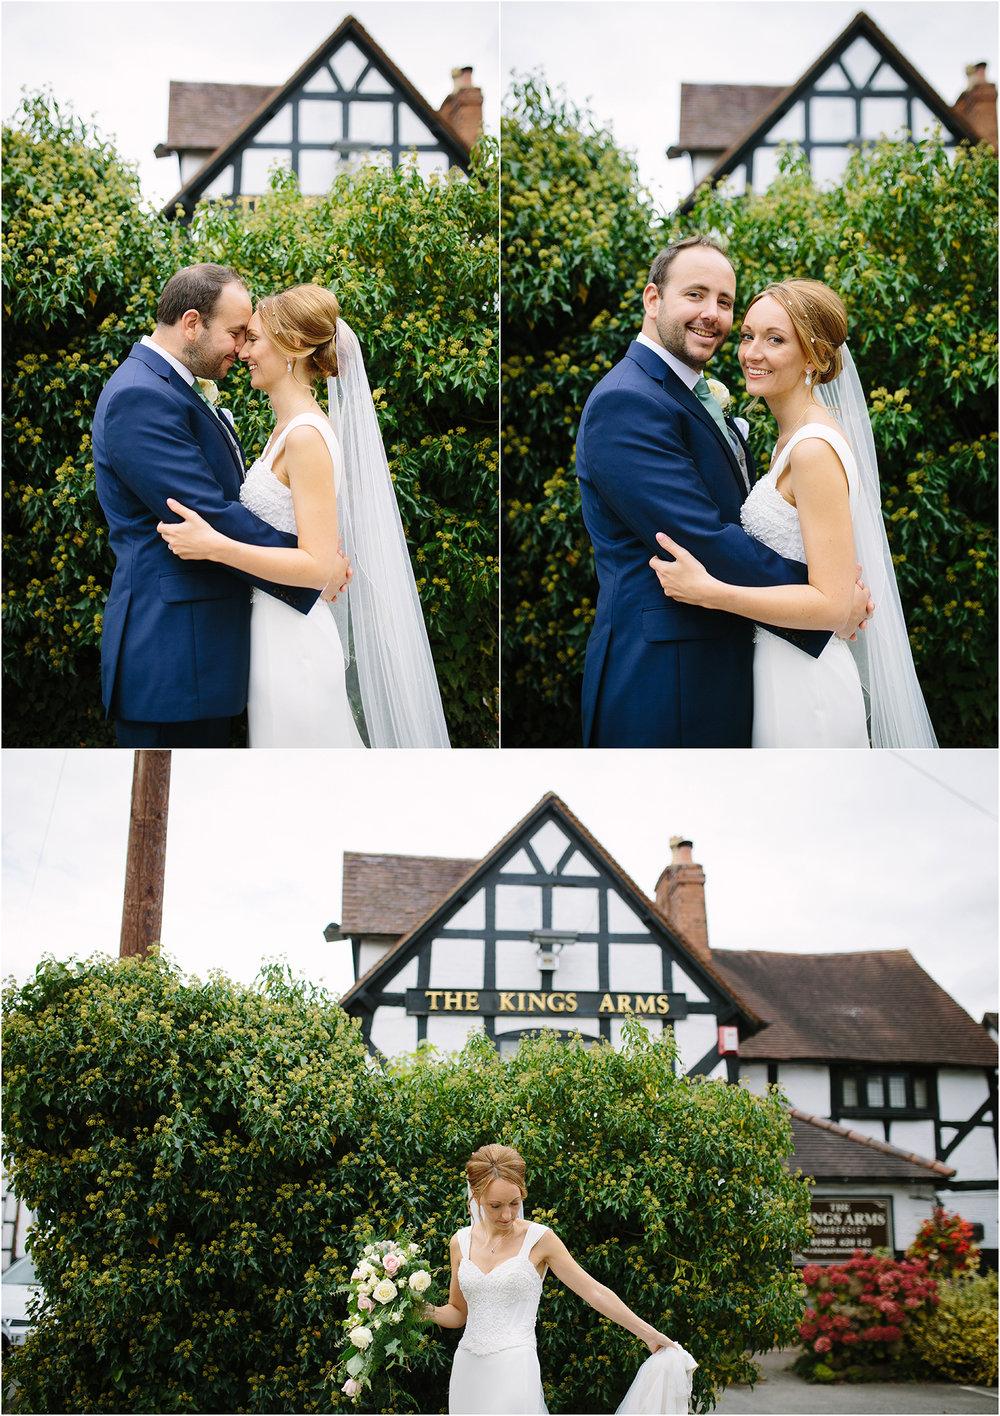 creative-wedding-photographer-worcester-054.jpg